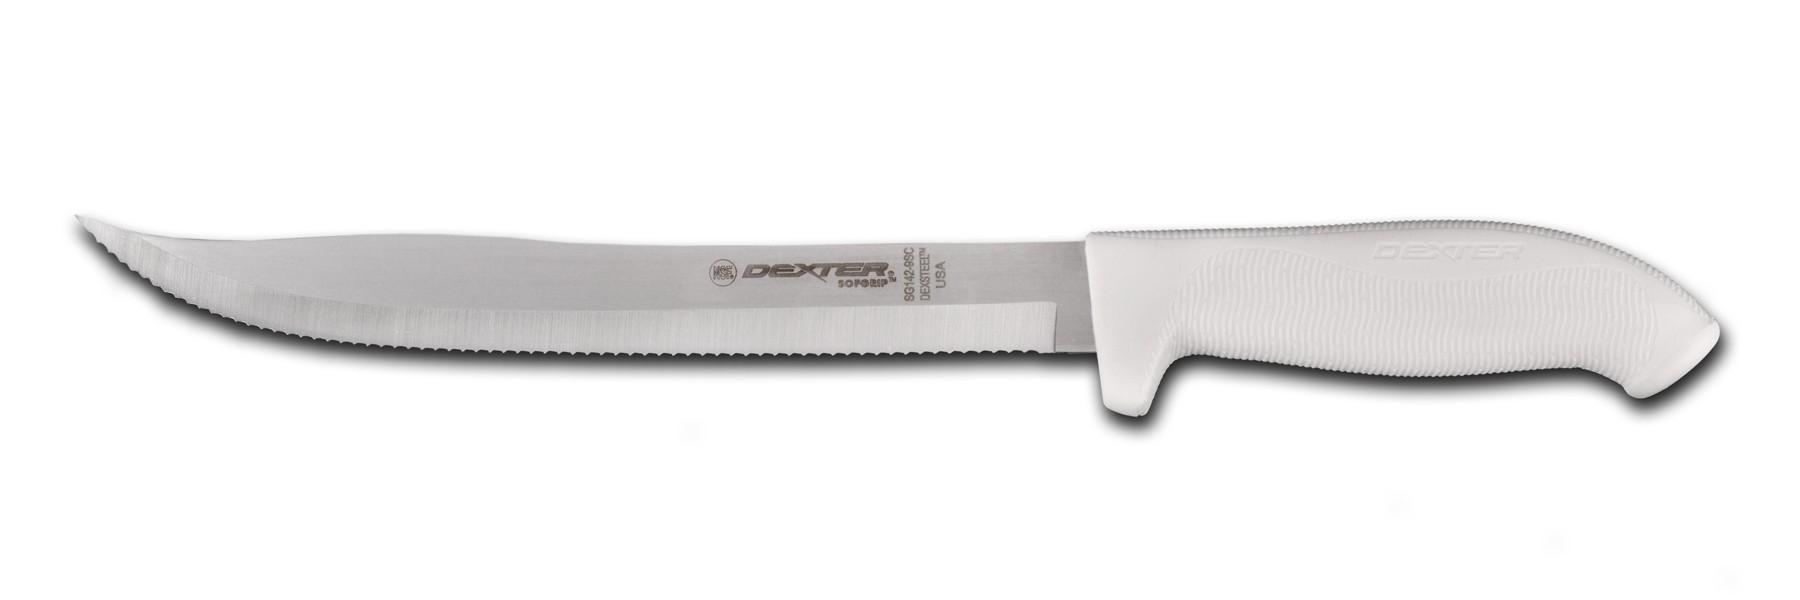 Dexter Russell 24263 slicer